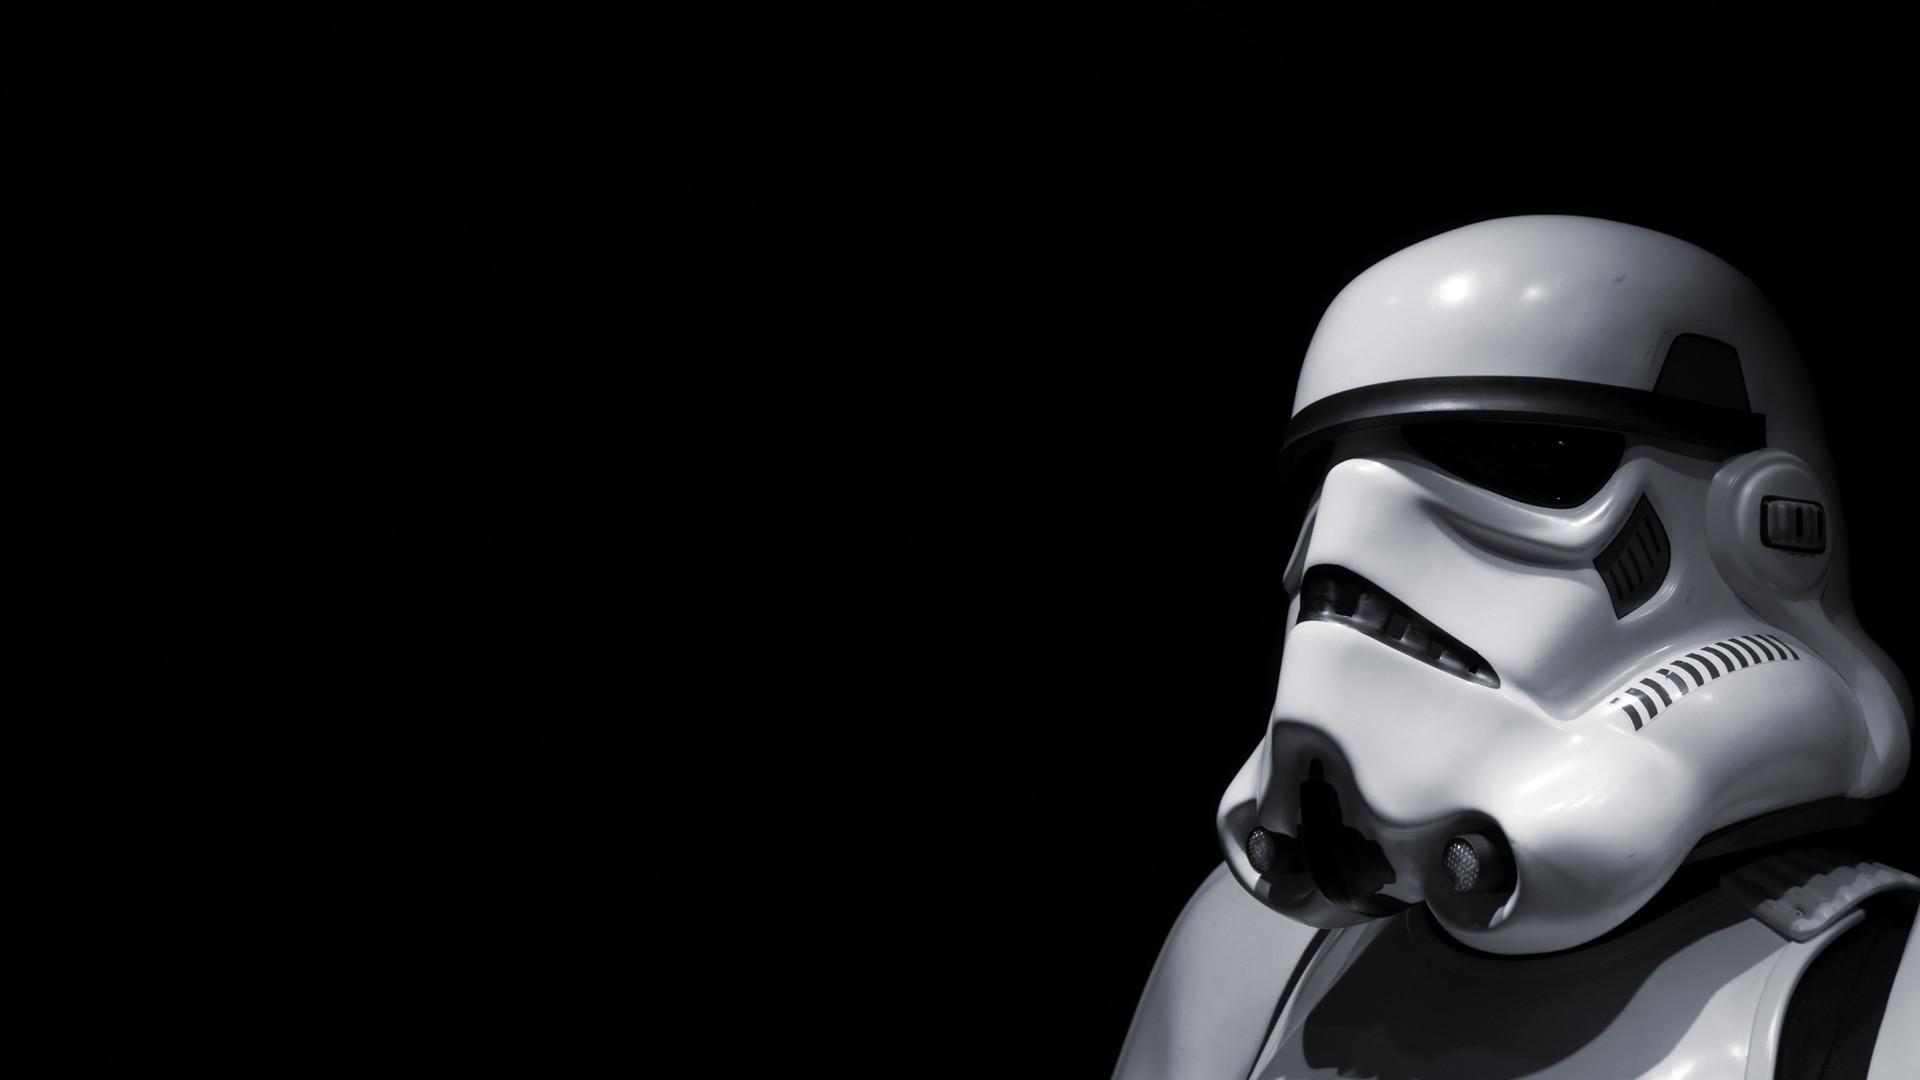 Storm trooper wallpaper wallpapersafari - Stormtrooper suit wallpaper ...